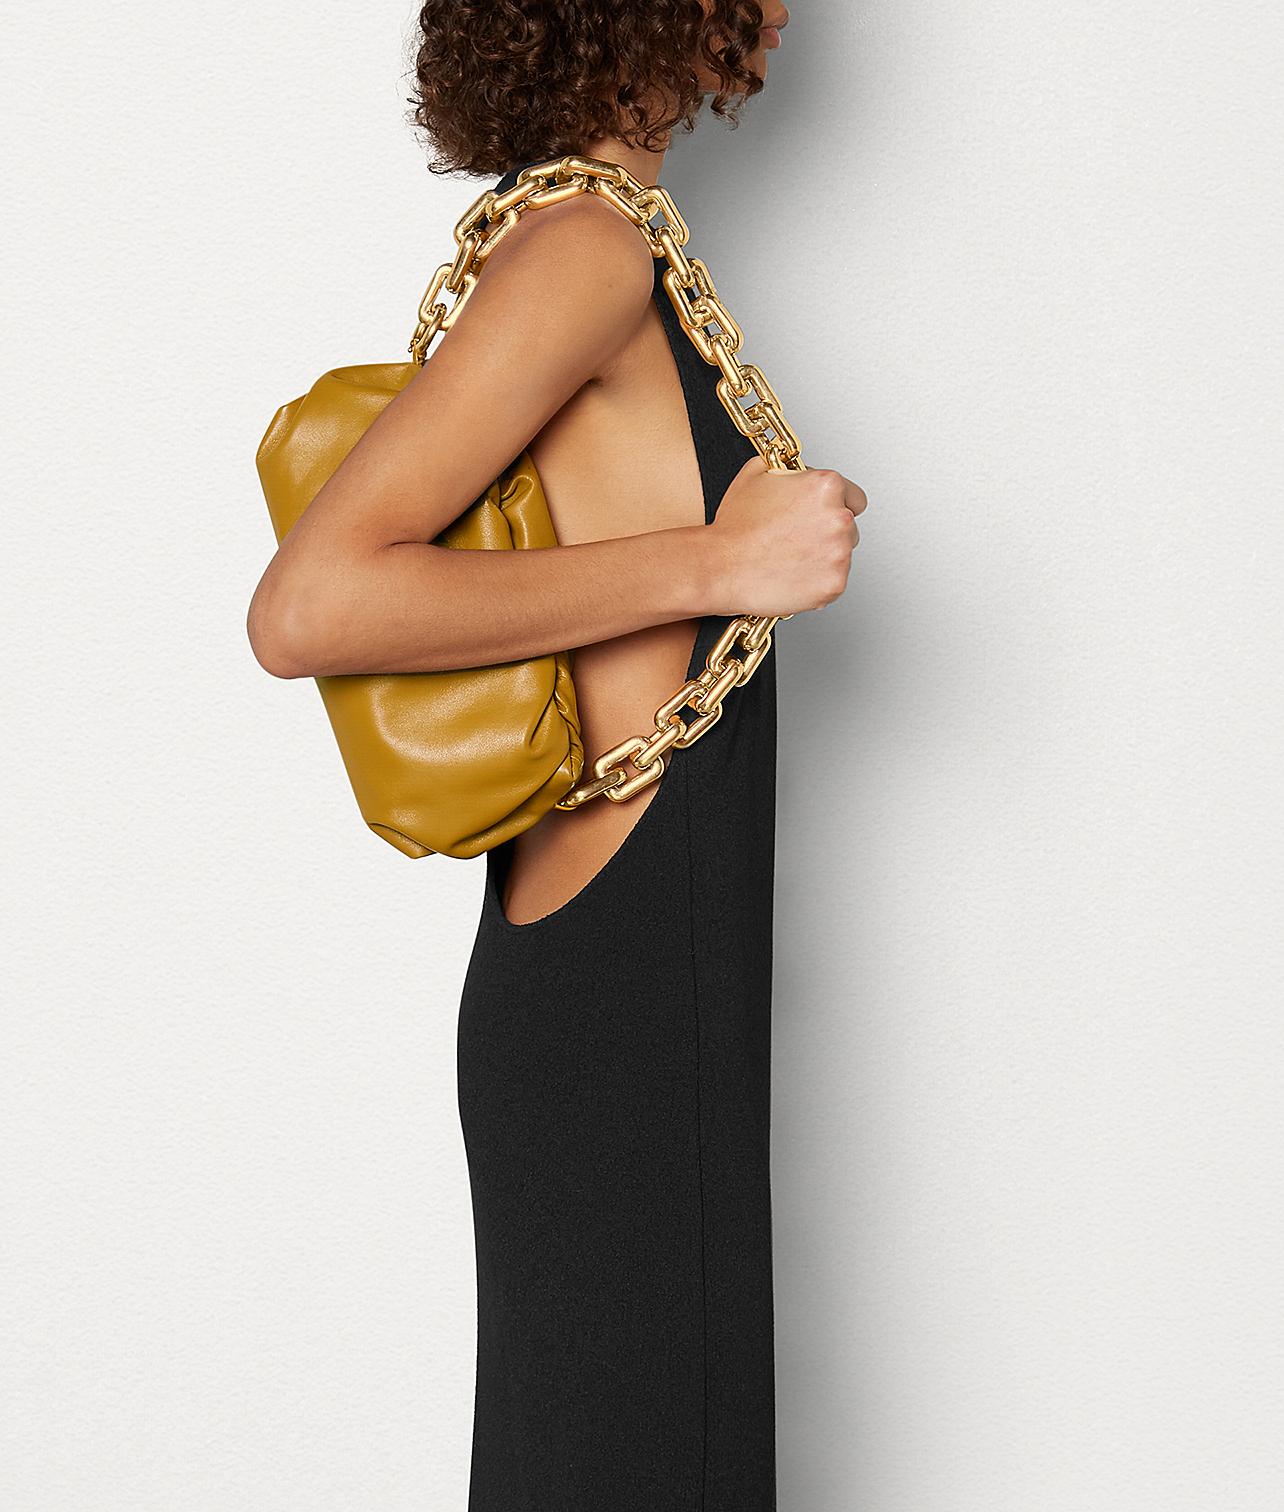 Bottega Veneta bag with chain